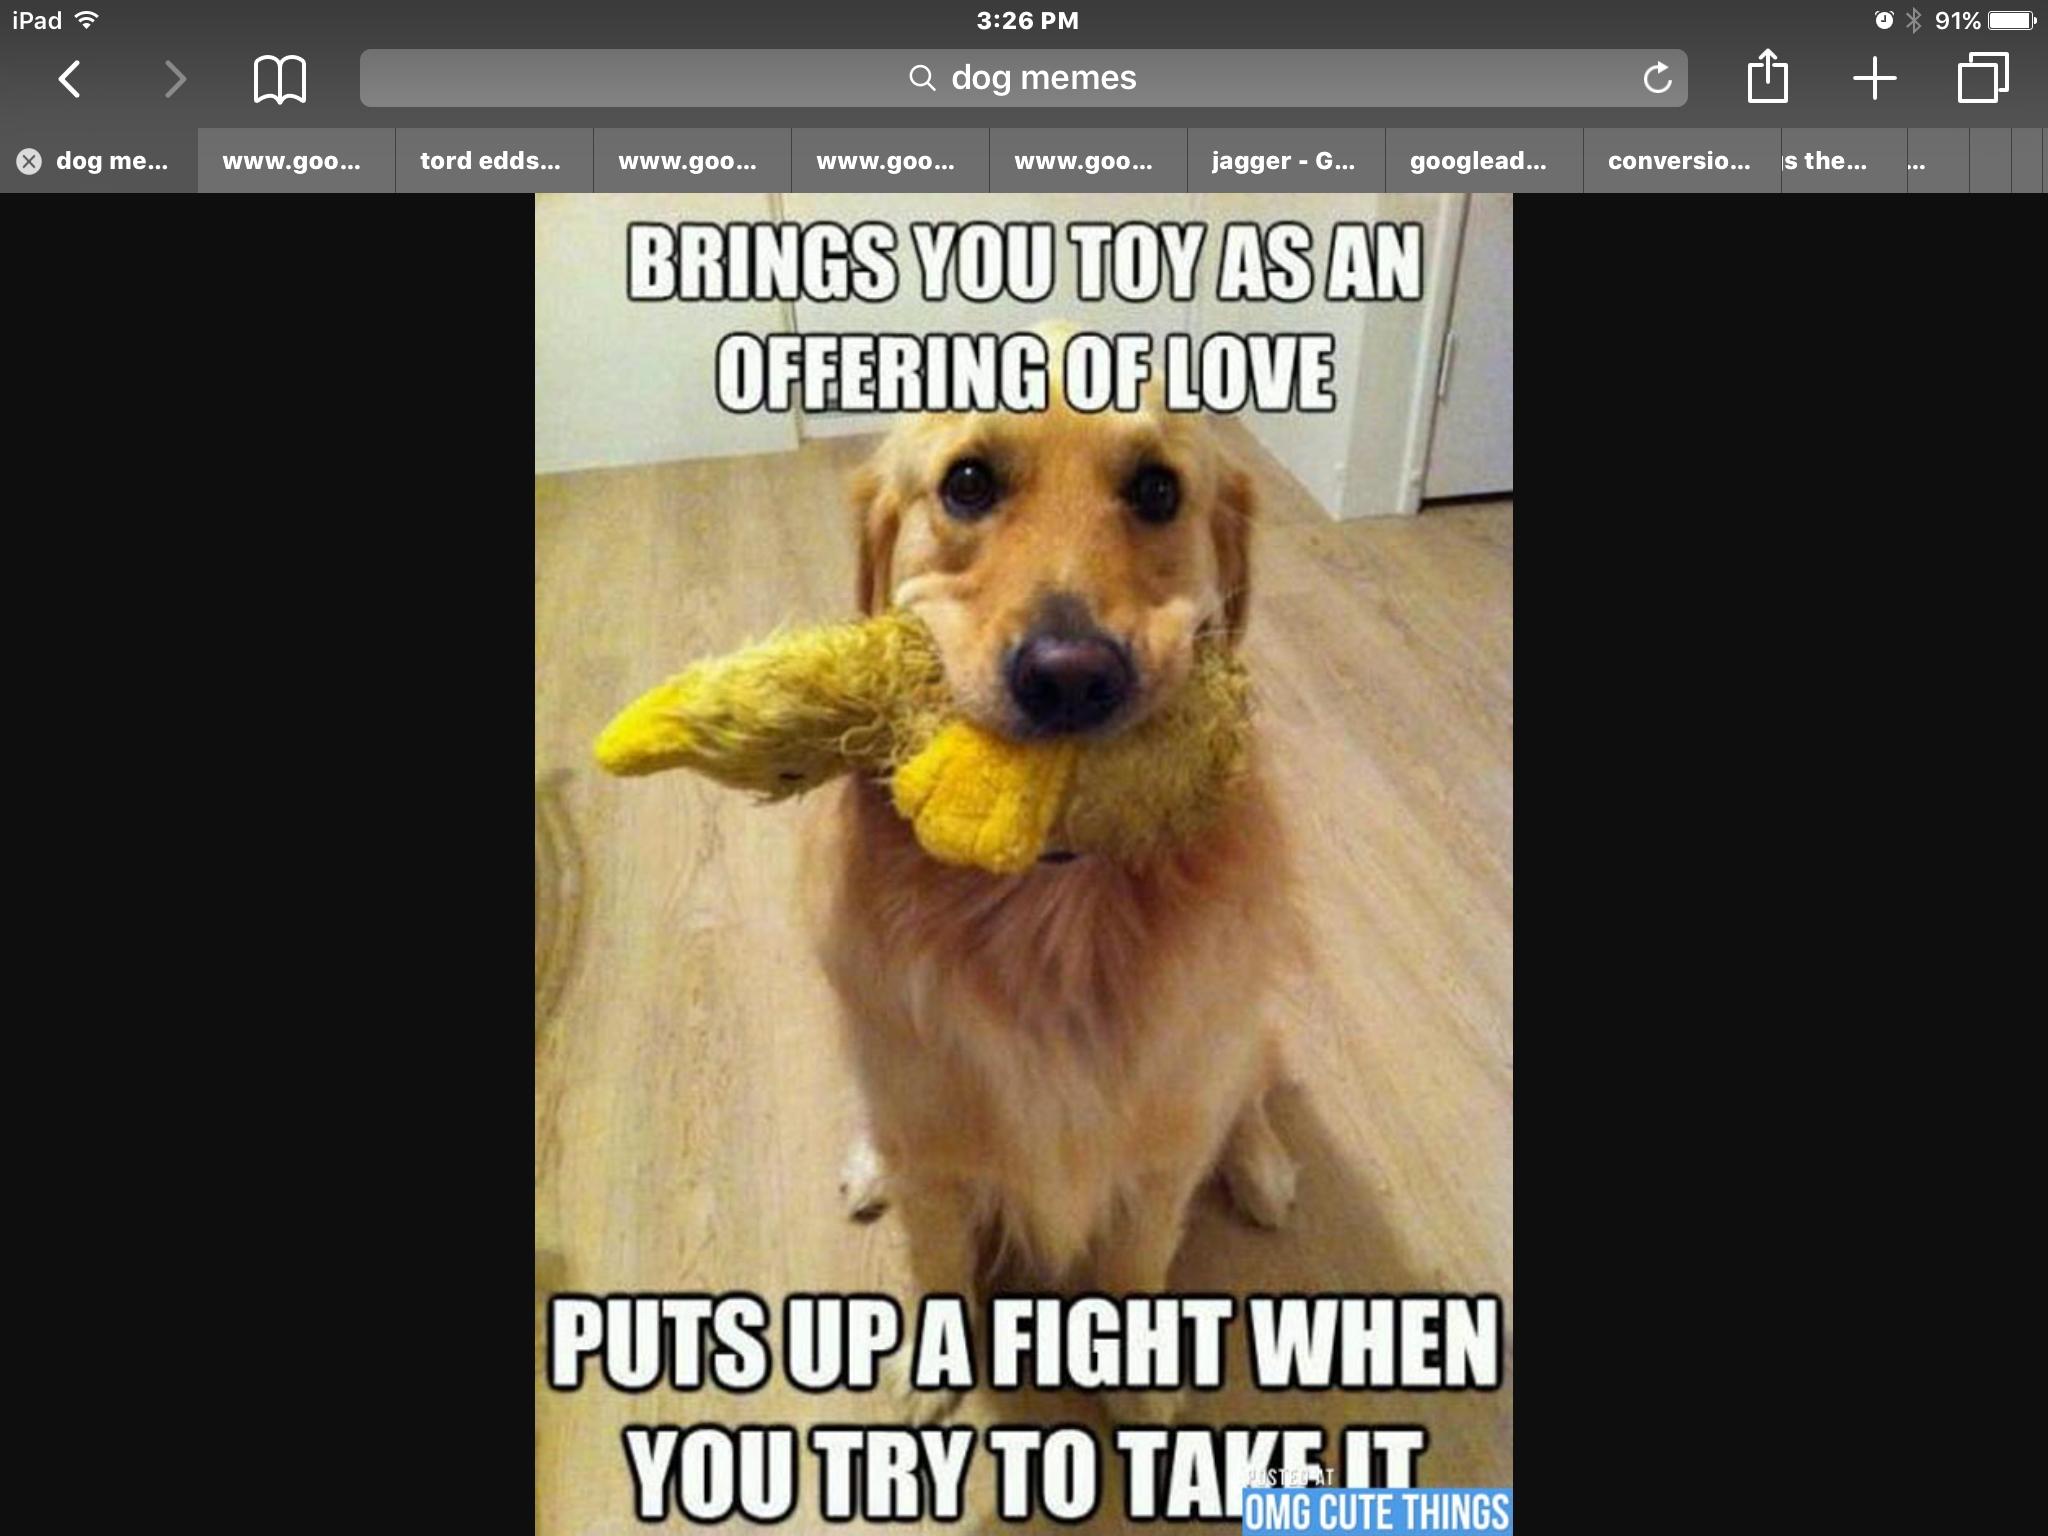 Funny Dog Meme Images : Pin by xdoughnutgirlx 5150 on dog memes pinterest funny animal